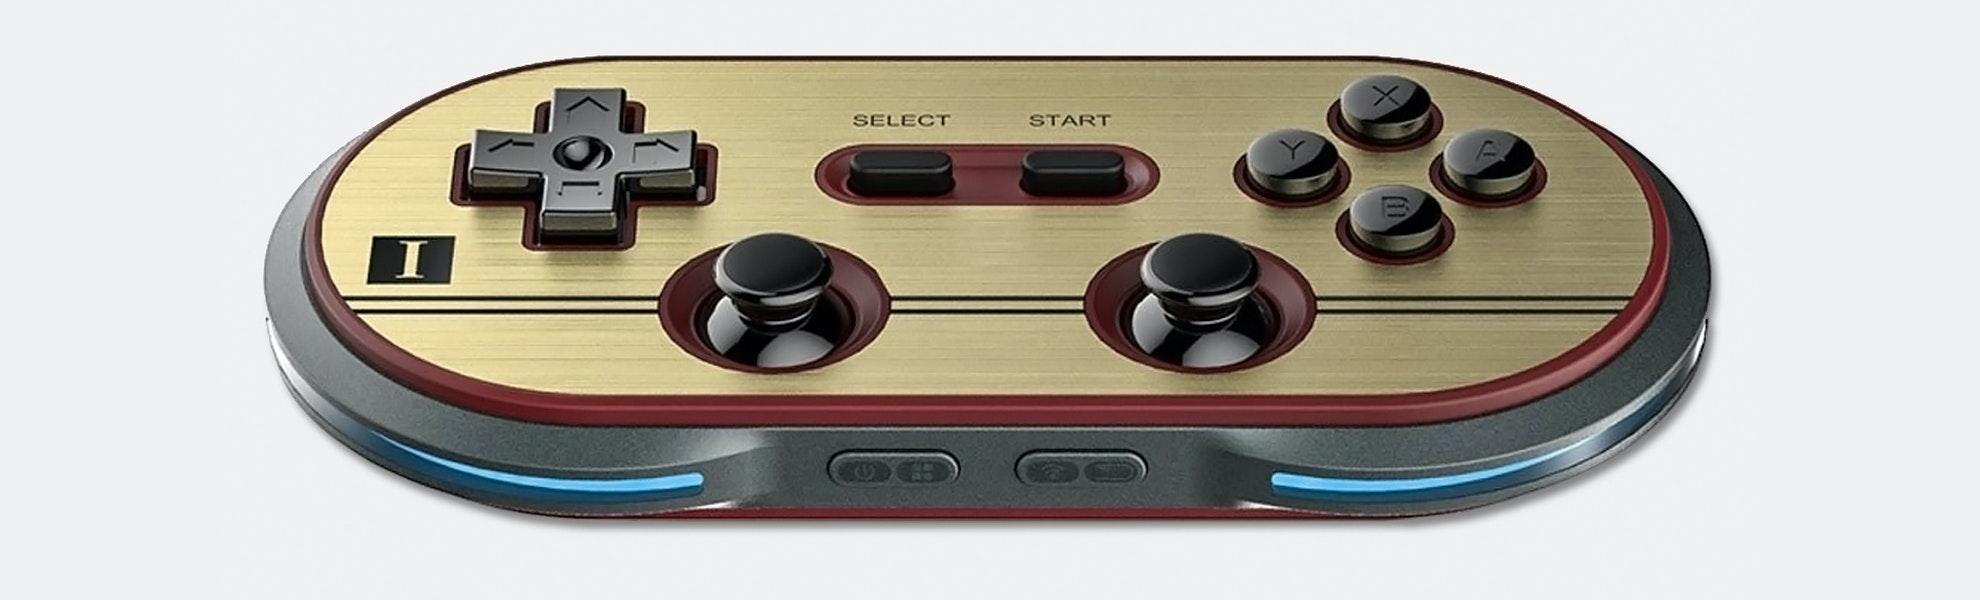 8Bitdo Pro Bluetooth Gamepads